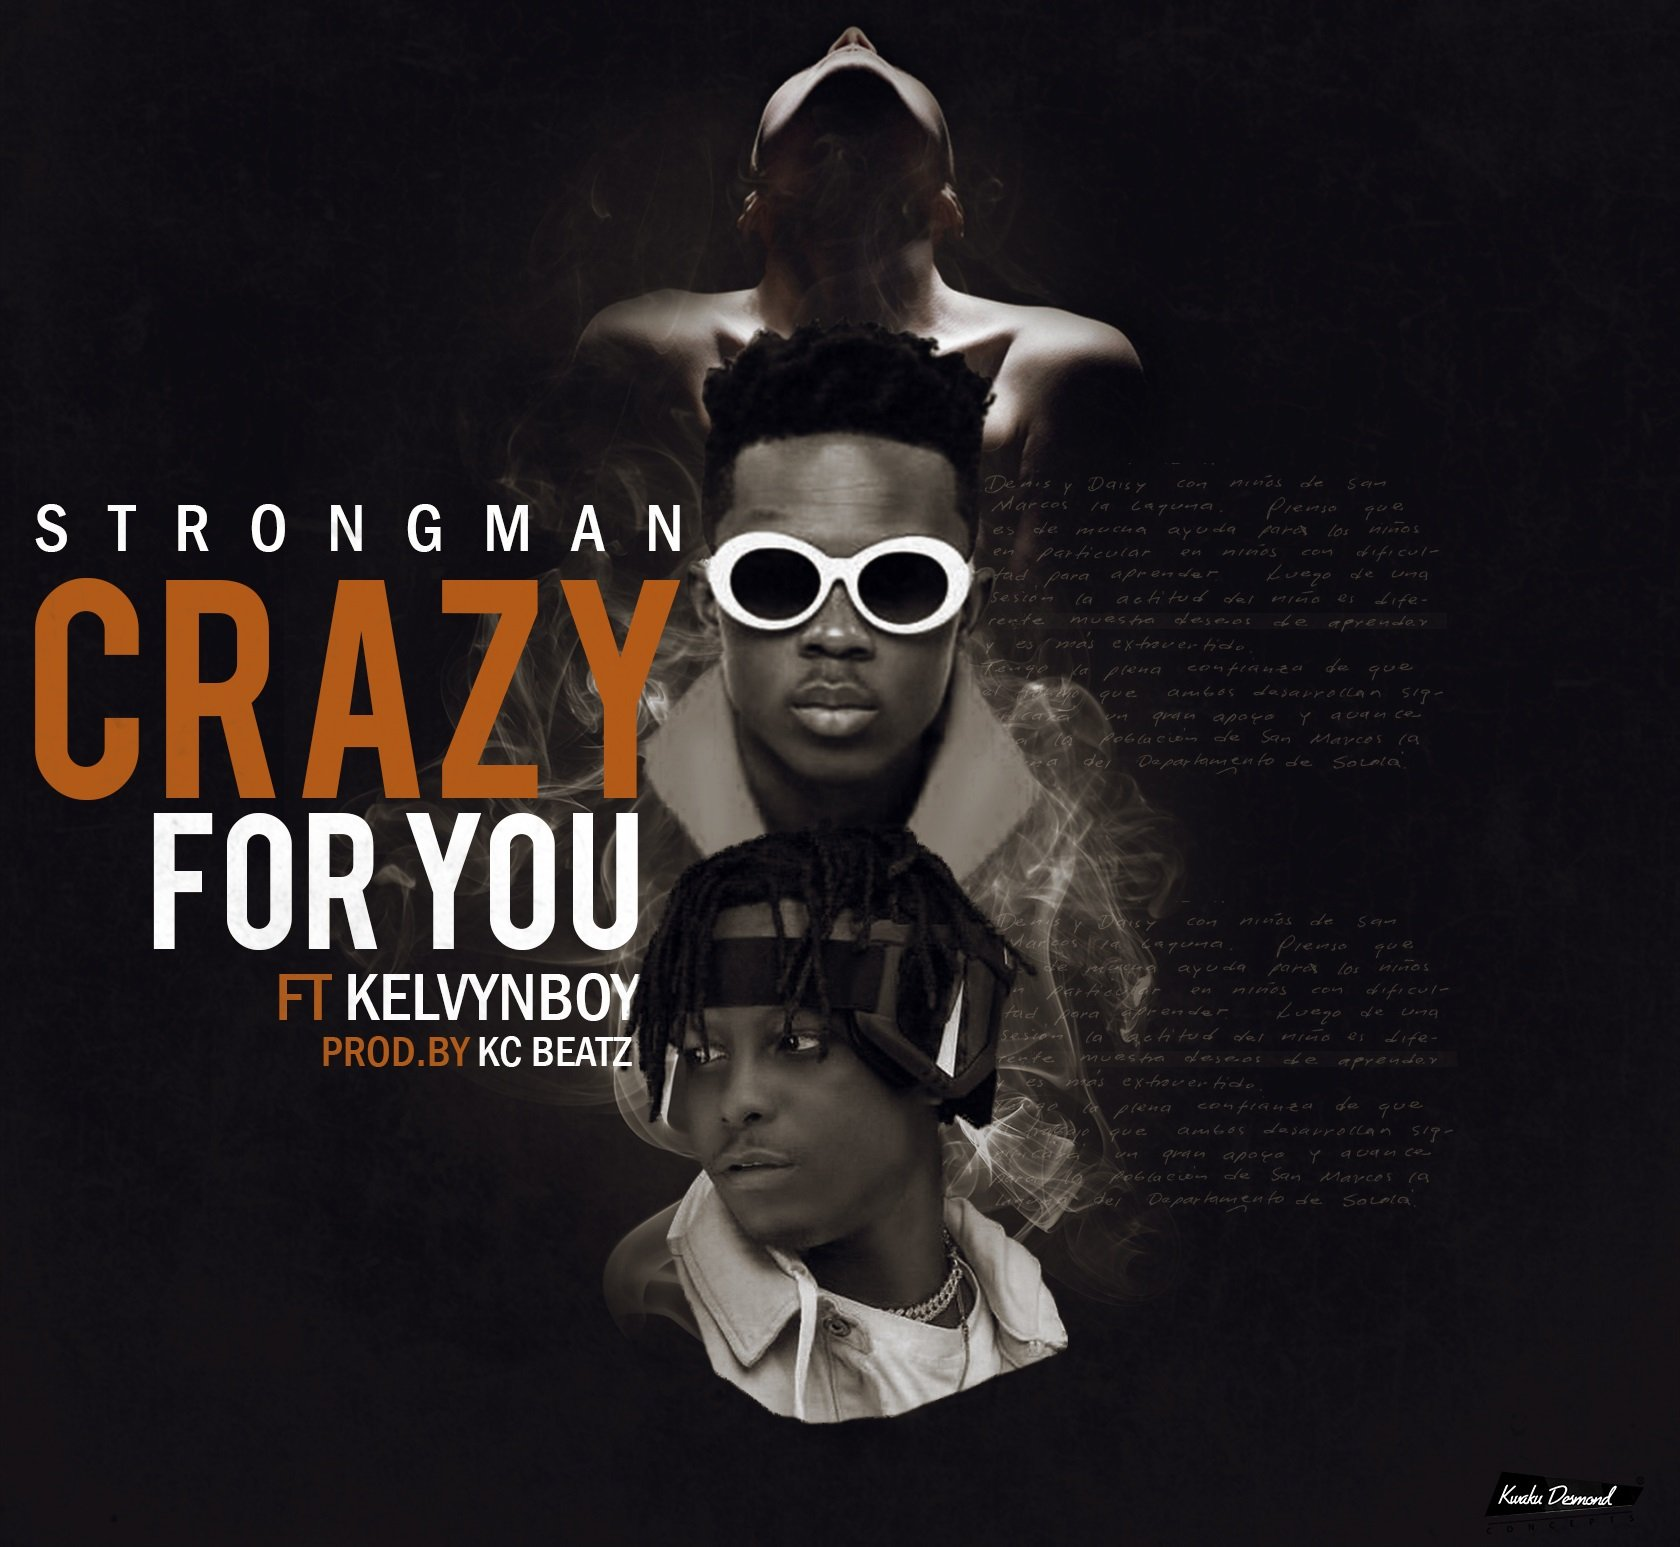 Crazy For You (Ft Kelvyn Boy)